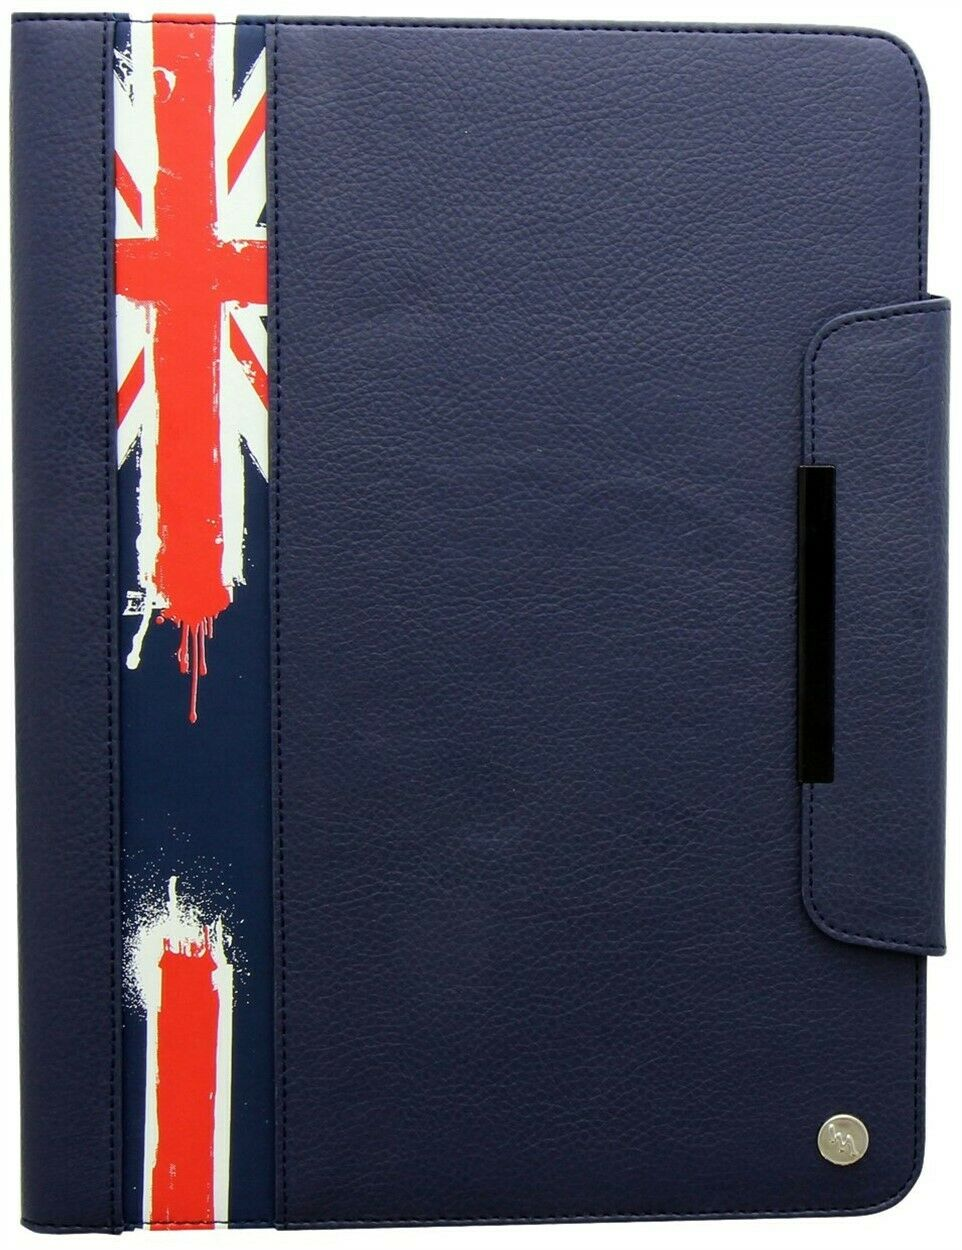 "Etui universel  10"", Tnb London + Stylet, Housse de protection tablette, Neuf"